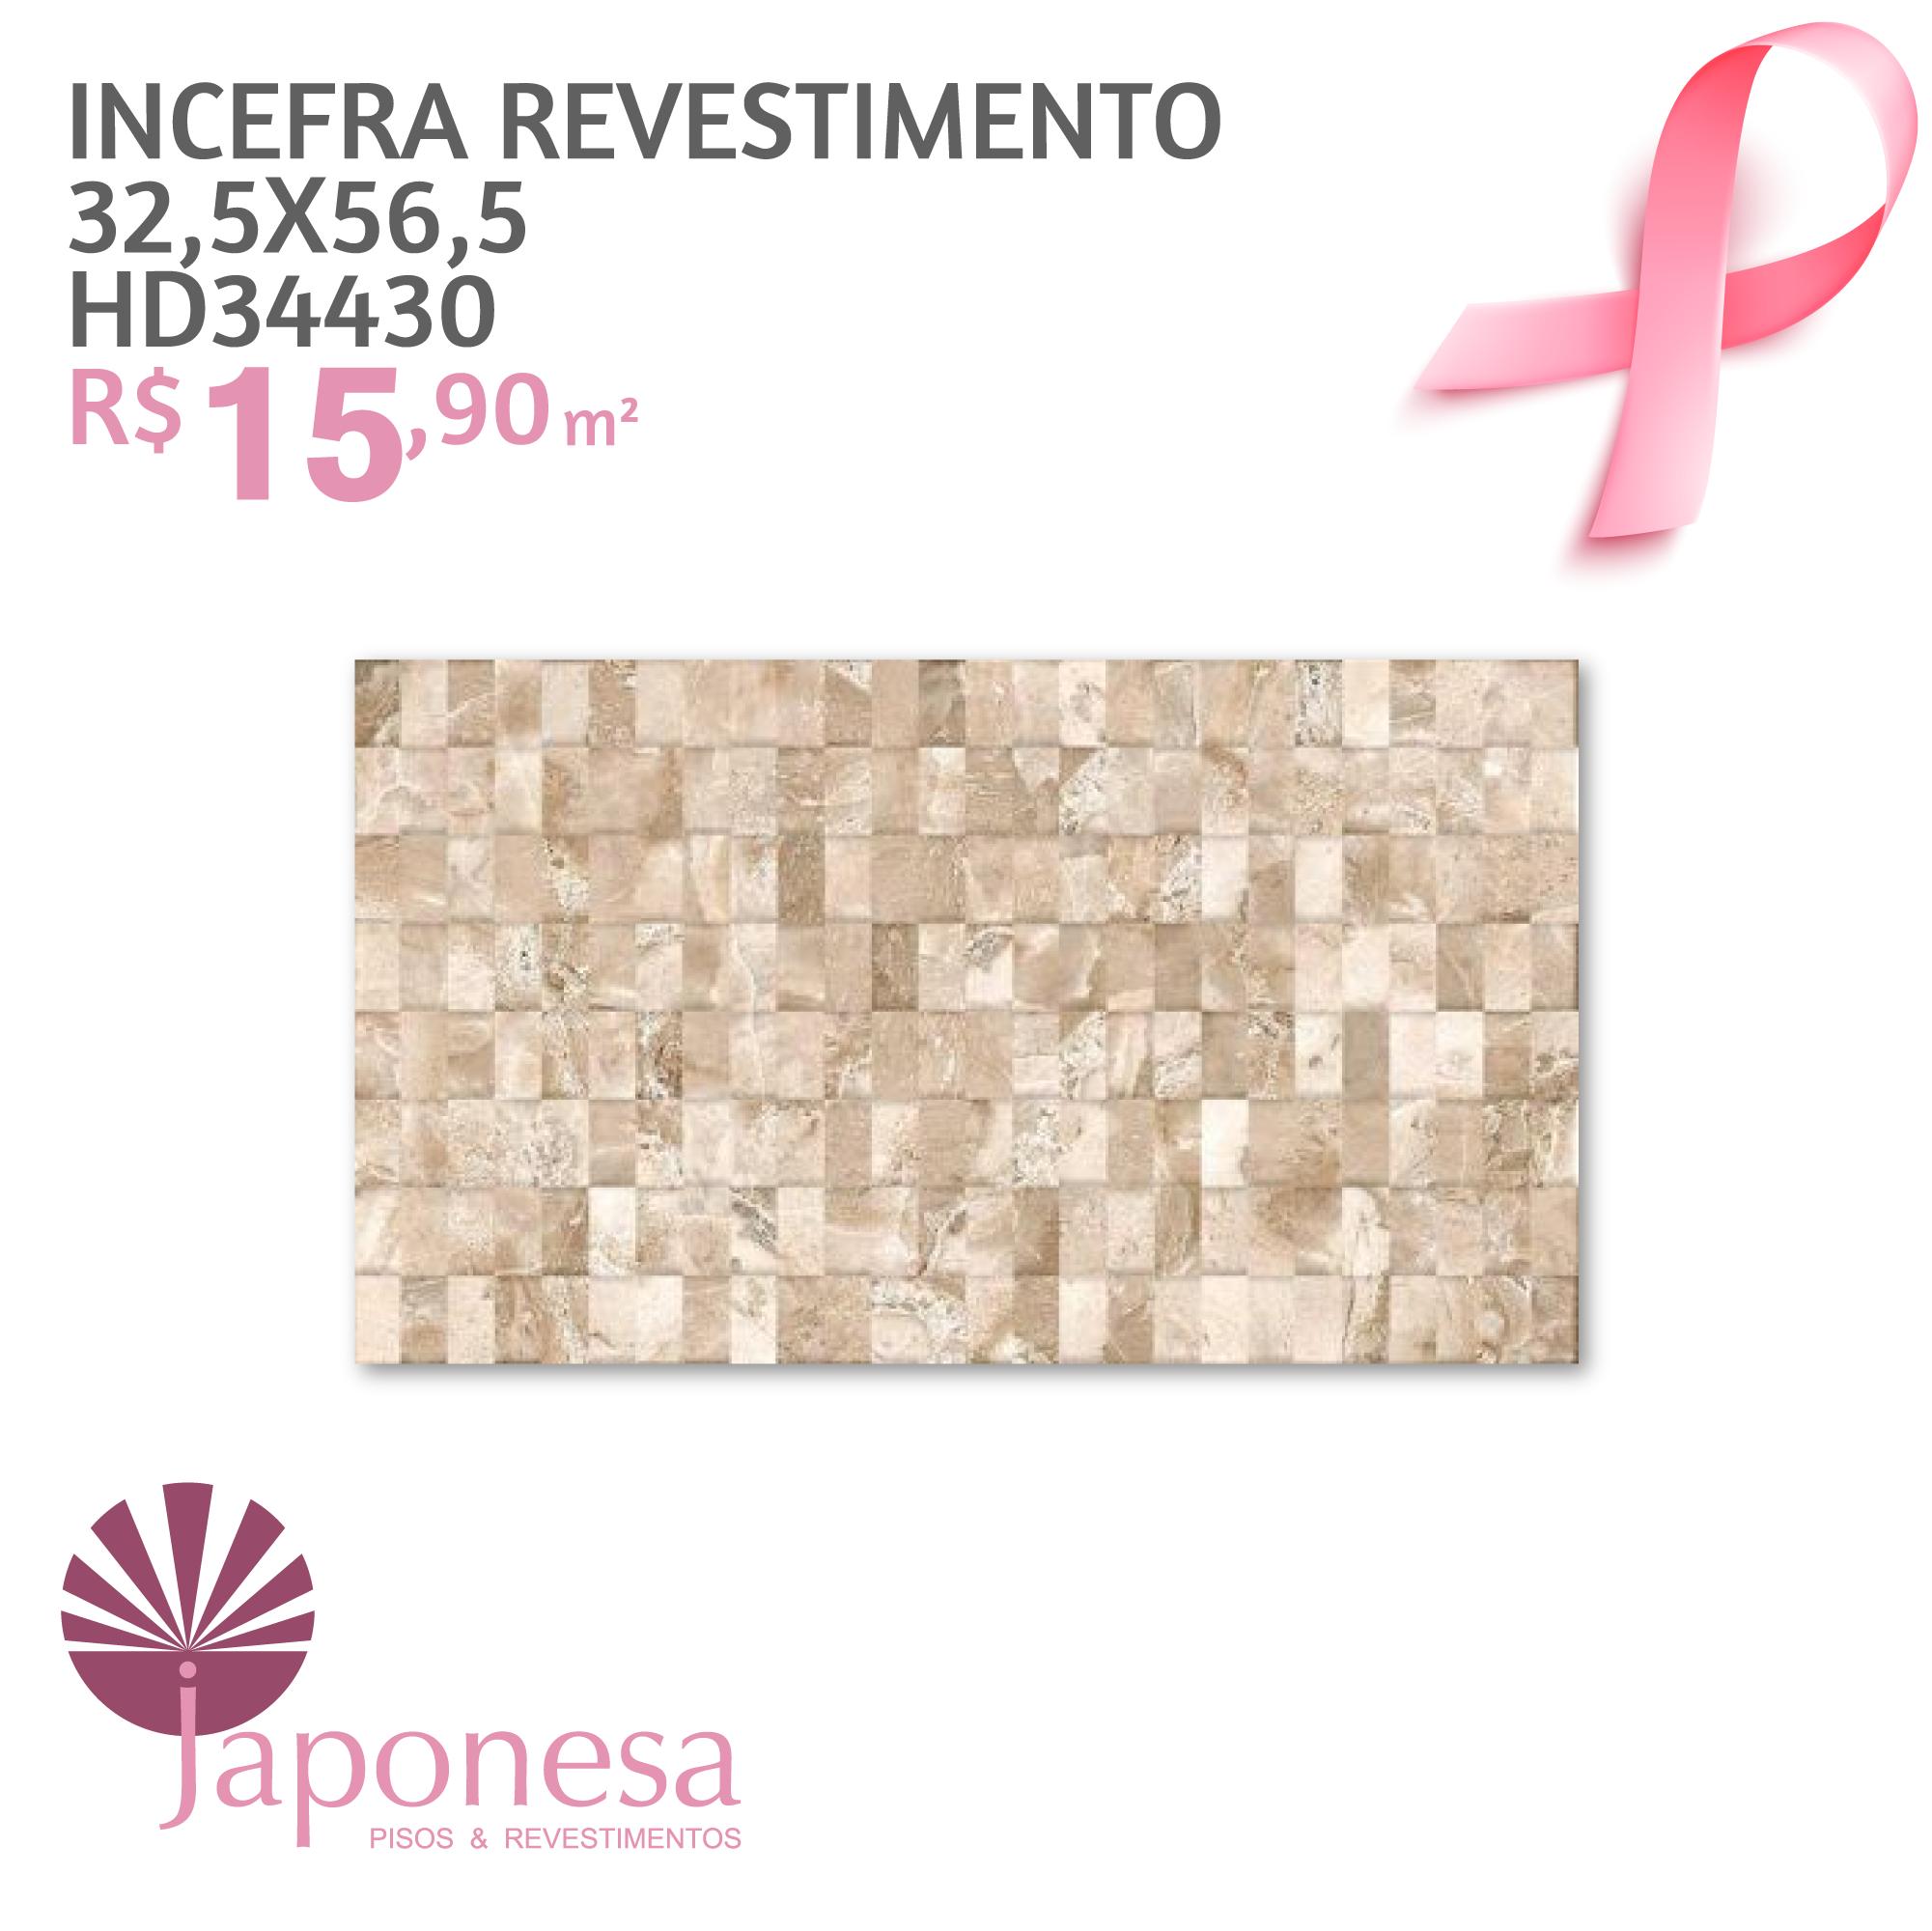 Incefra Revestimento 32,5×56,5 HD34430